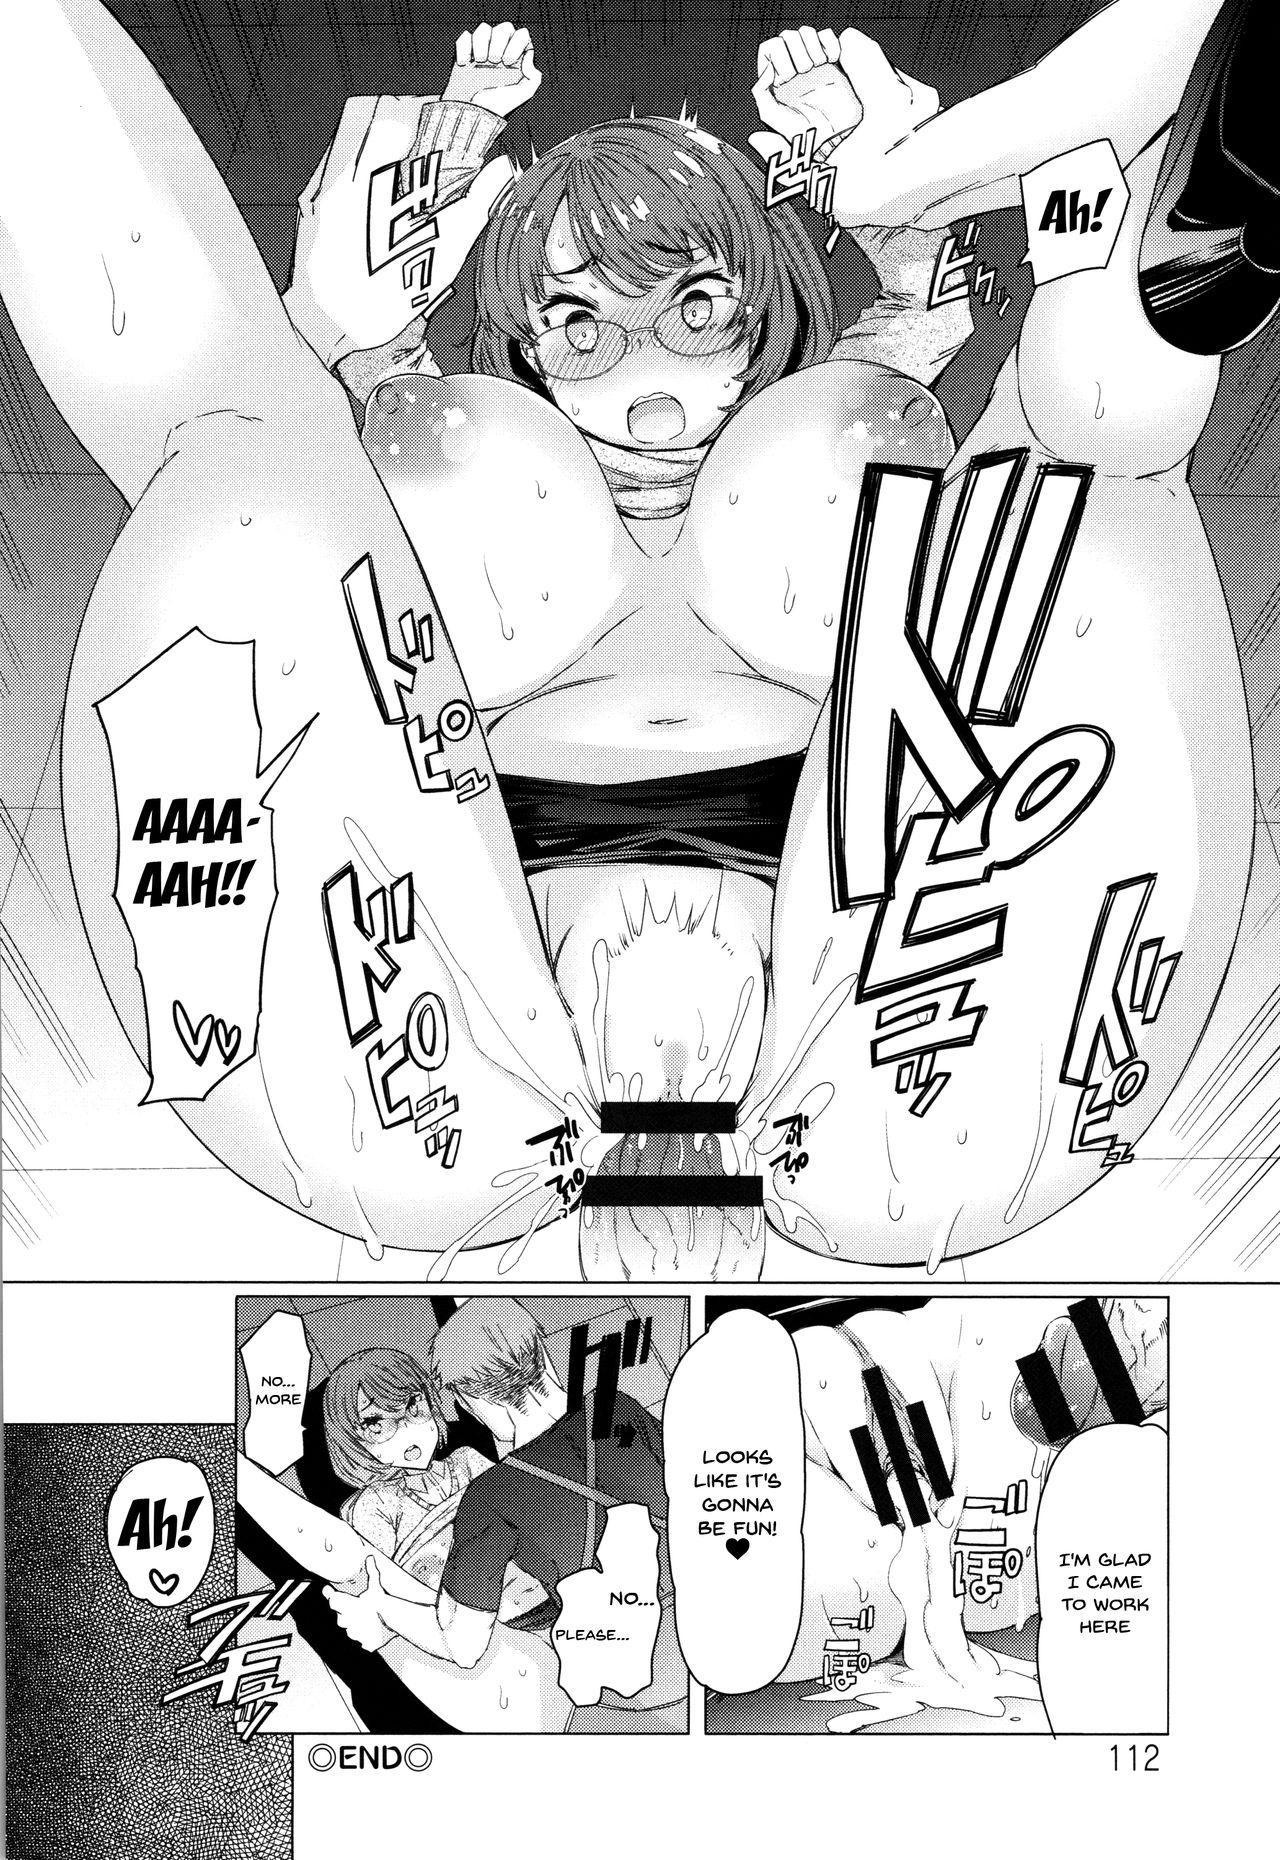 Hitozuma ga Ero Sugite Shigoto ni Naranai! | These Housewives Are Too Lewd I Can't Help It! Ch.1-7 111